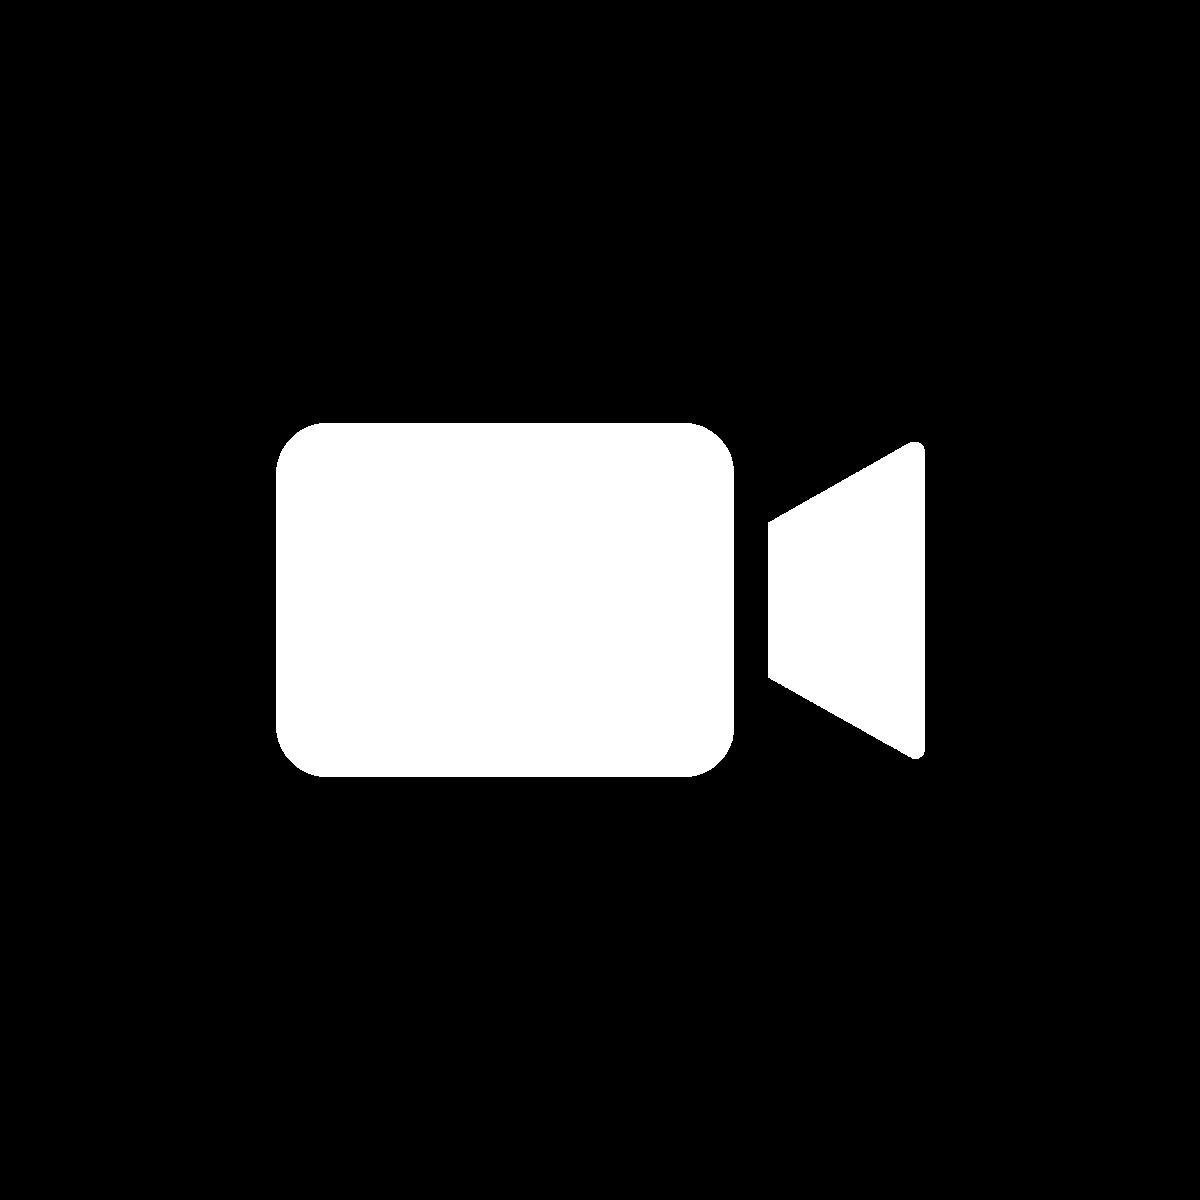 noun_Video_966159